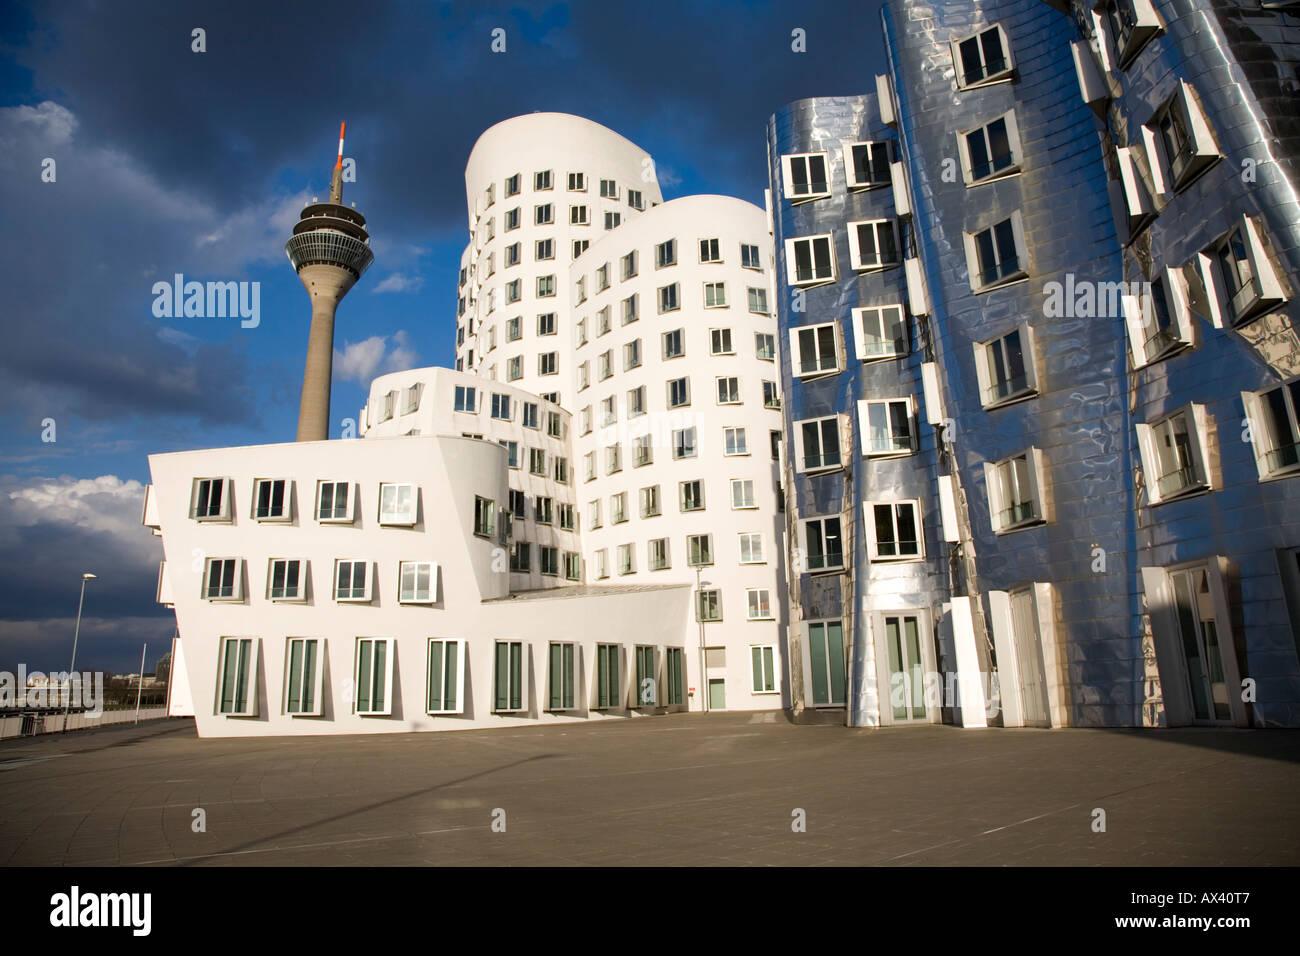 Neuer Zollhof by Frank Gehry, Dusseldorf, Germany - Stock Image